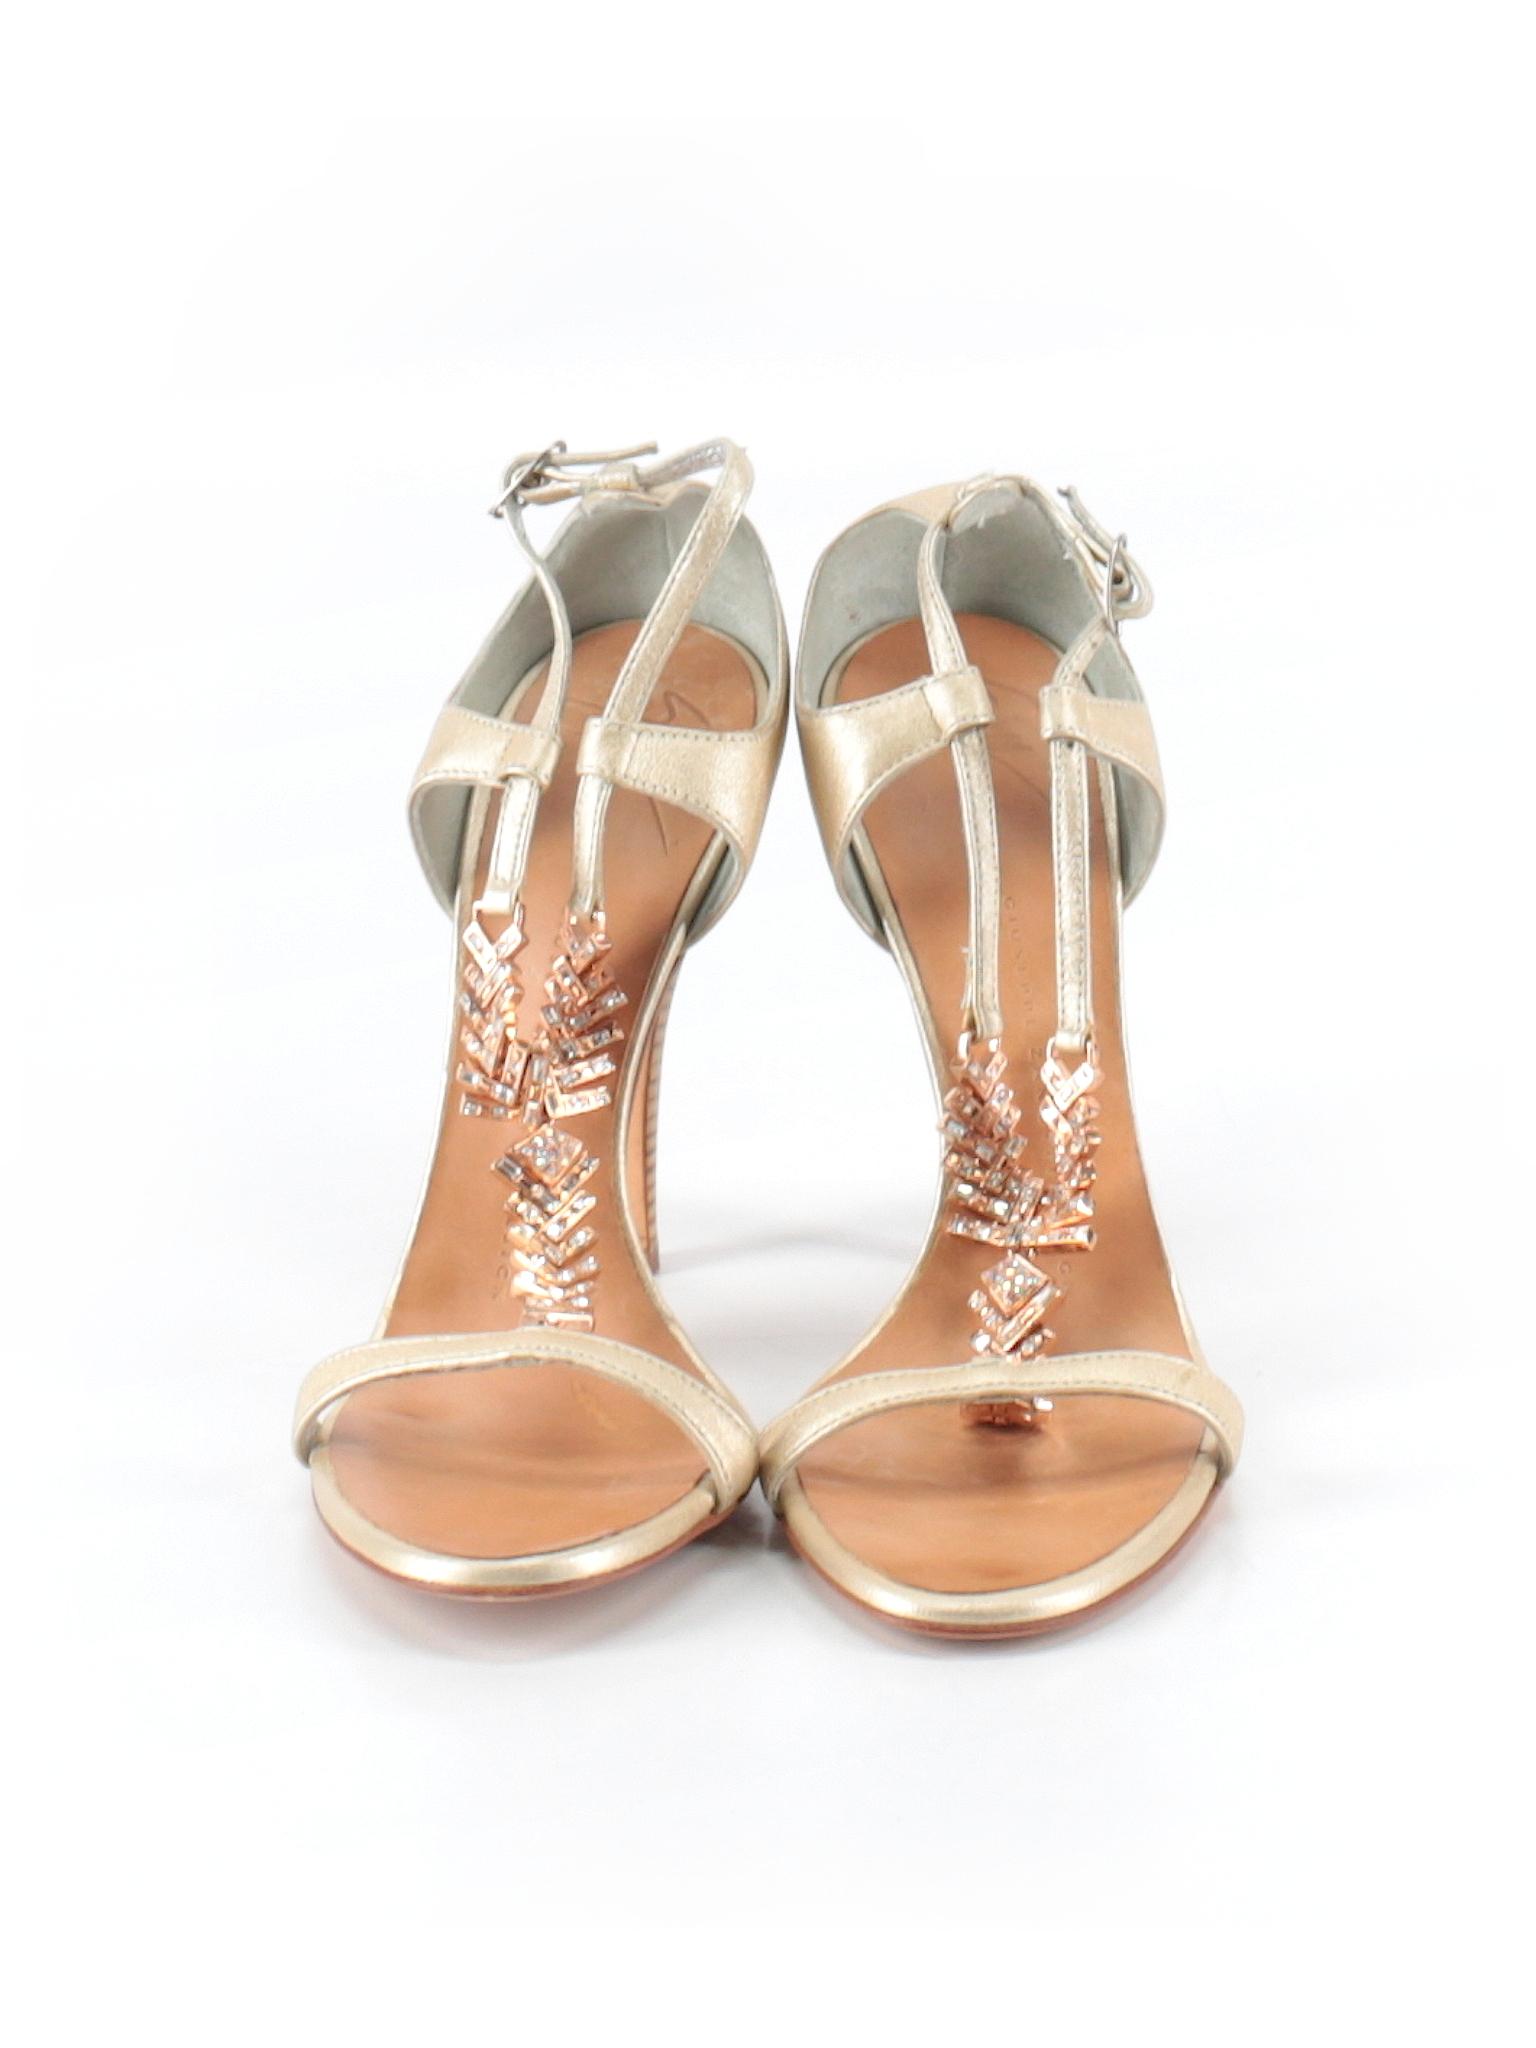 Boutique Heels Boutique promotion promotion Zanotti Giuseppe 0FvOw